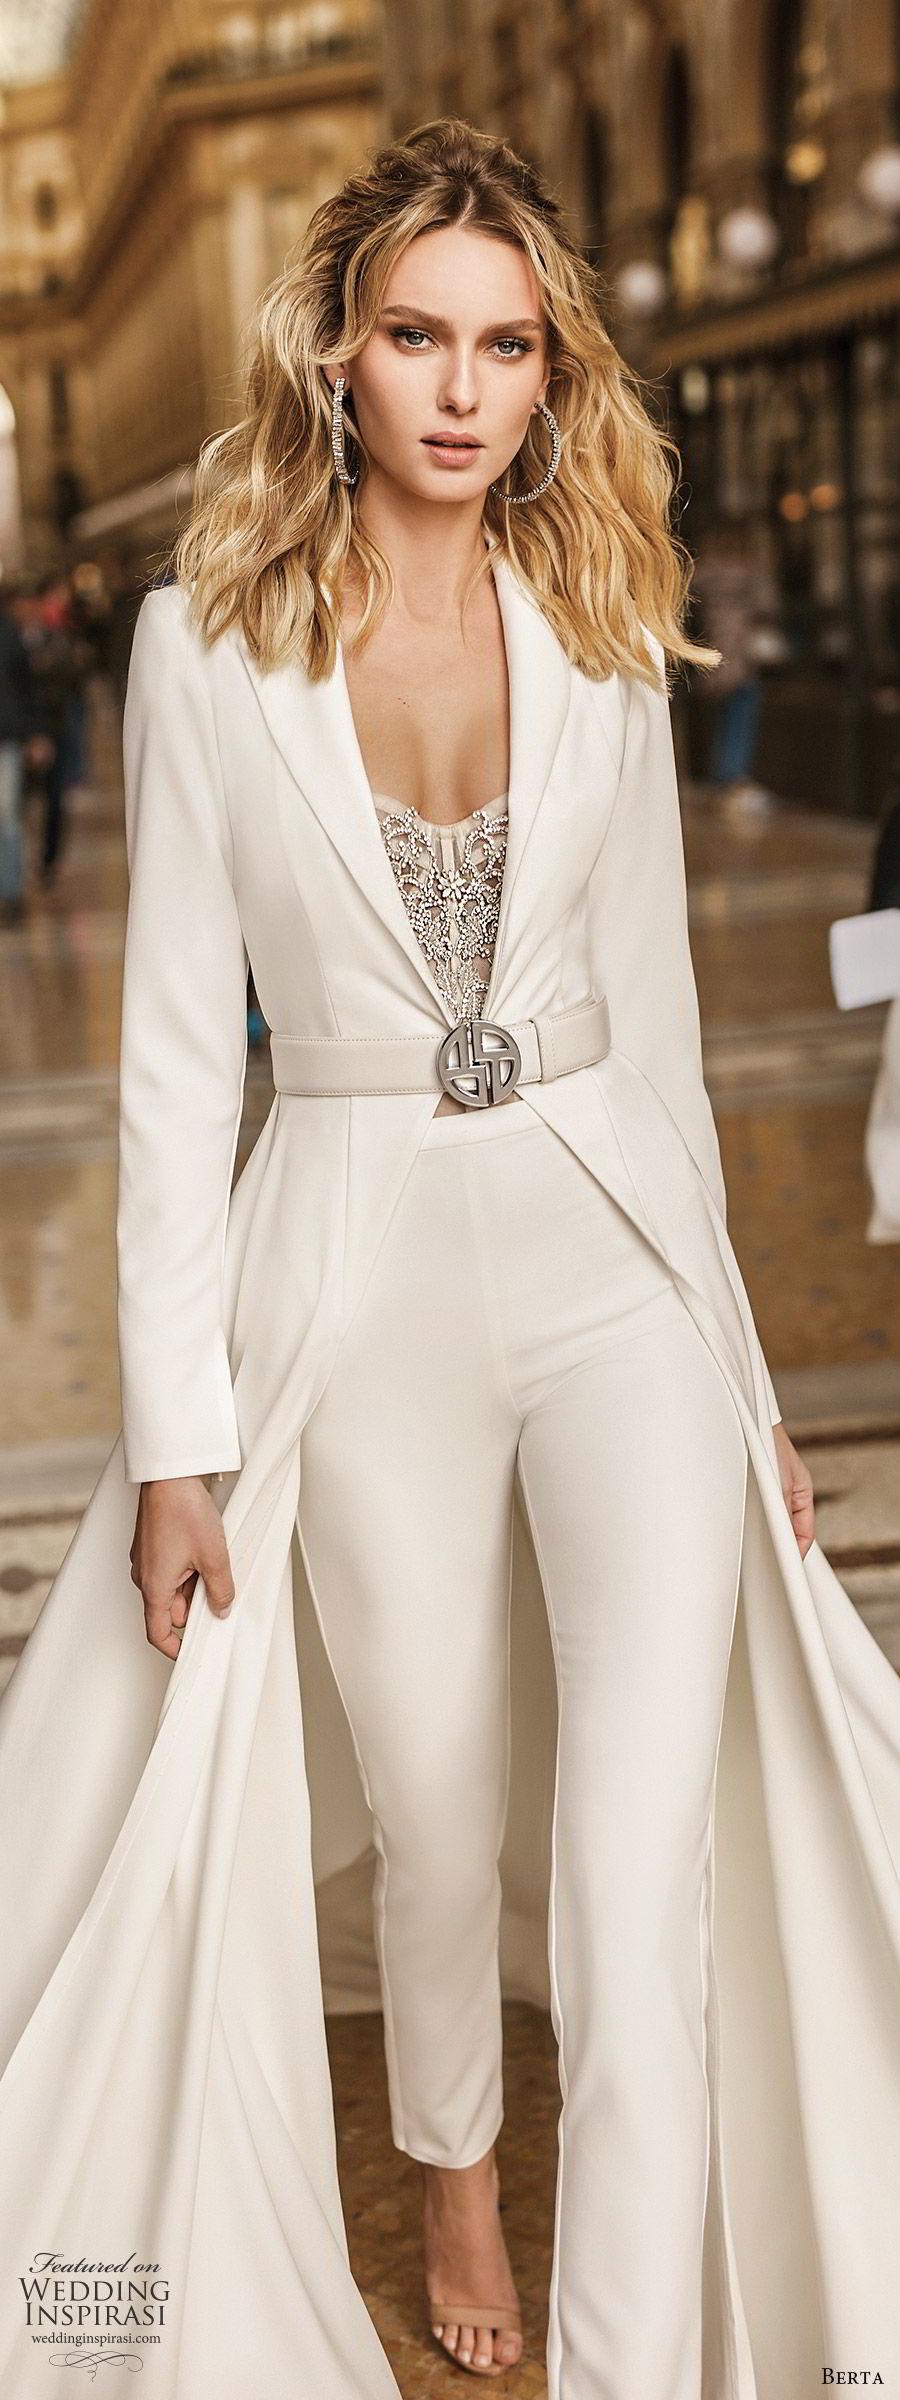 berta spring 2020 bridal long sleeve full length jacket minimal pant suit wedding dress (10) modern chic clean zv